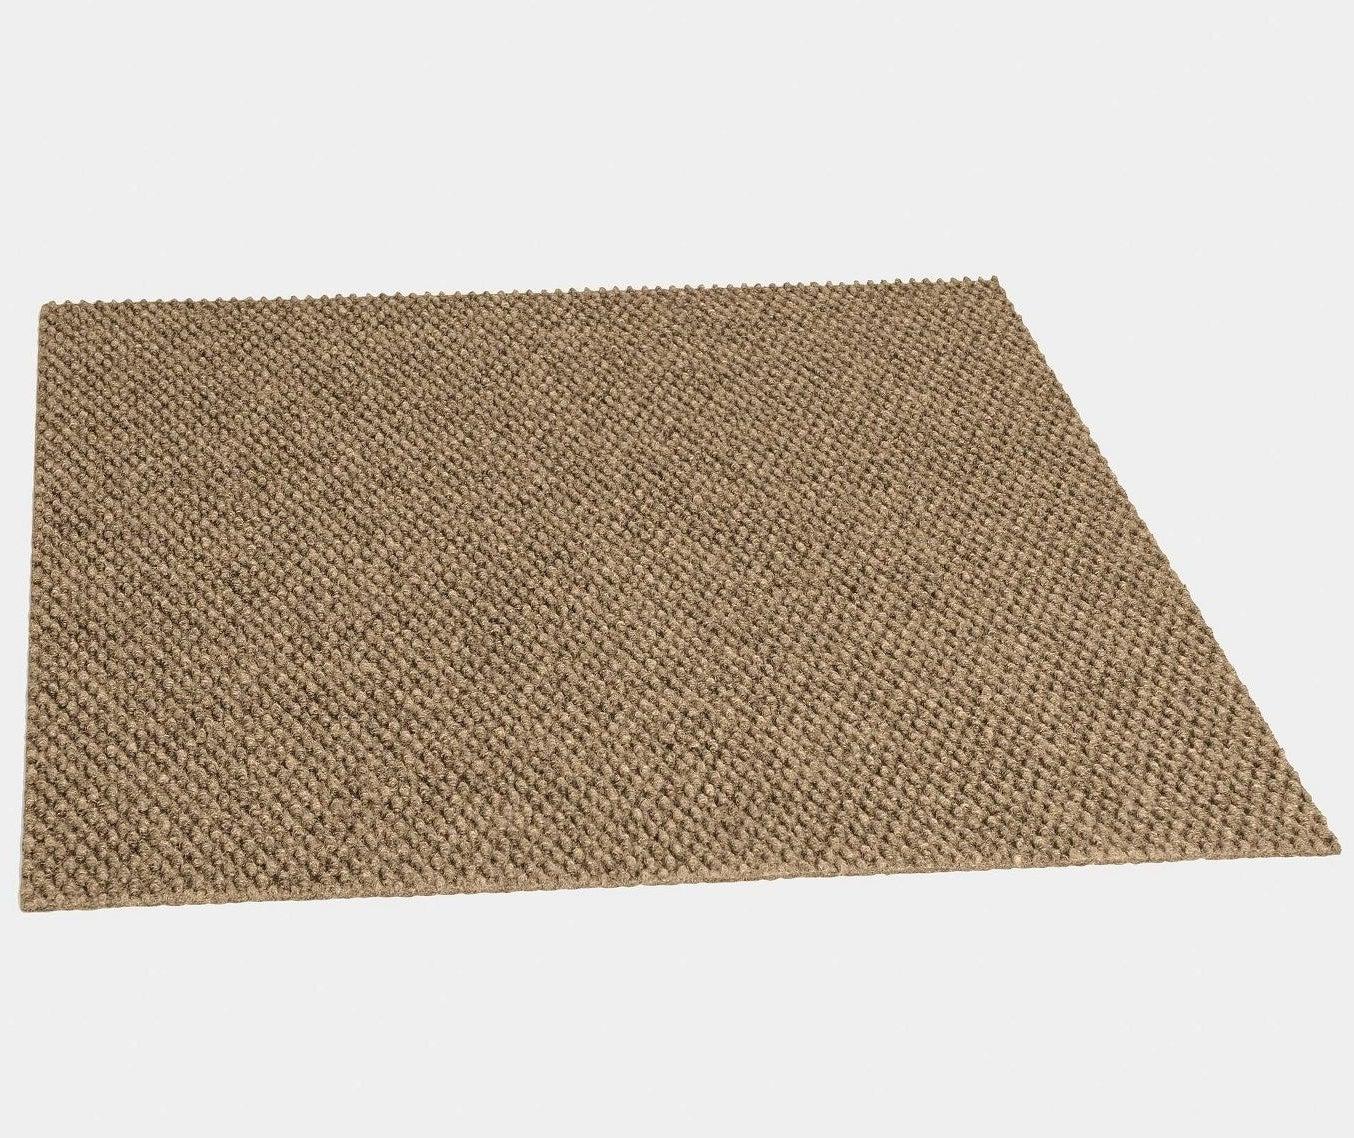 a single chestnut hobnail self-stick carpet tile